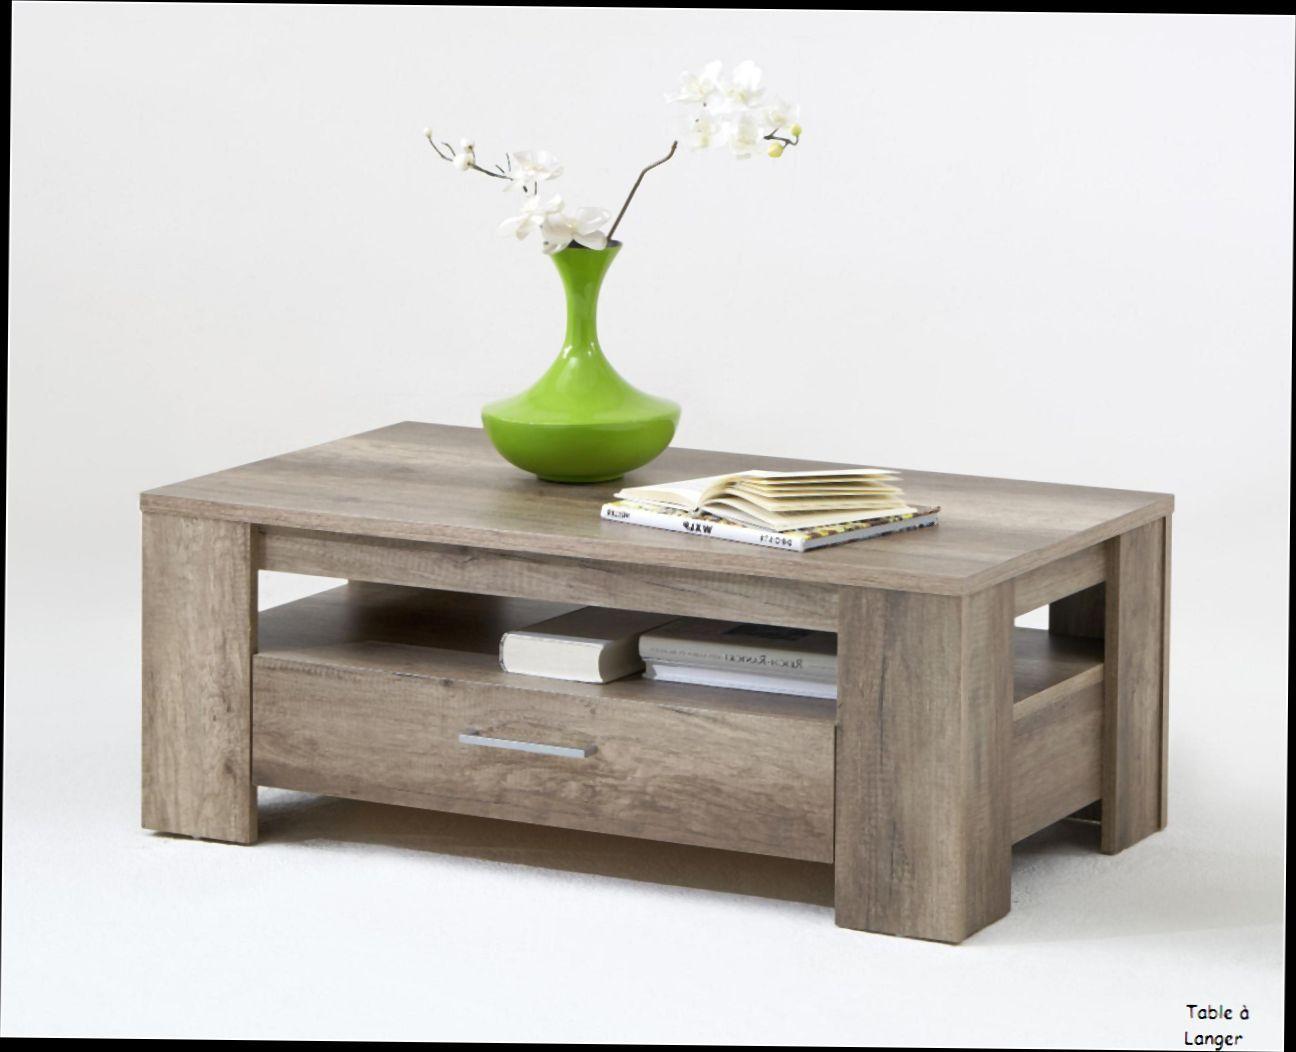 Table Avec Impressionnant TiroirDécoration Basse In Française T5lF1K3uJc